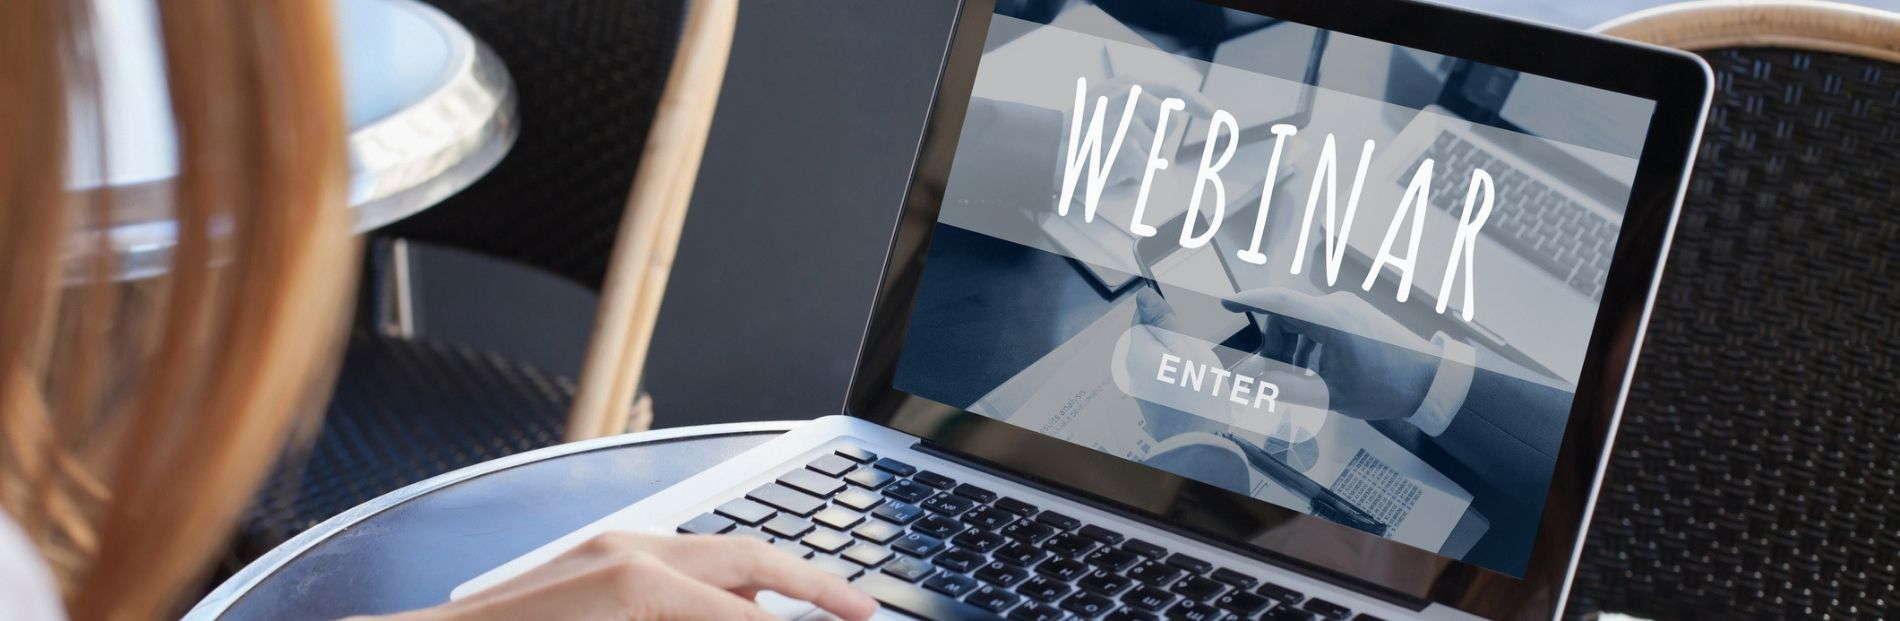 fertility support group online webinar